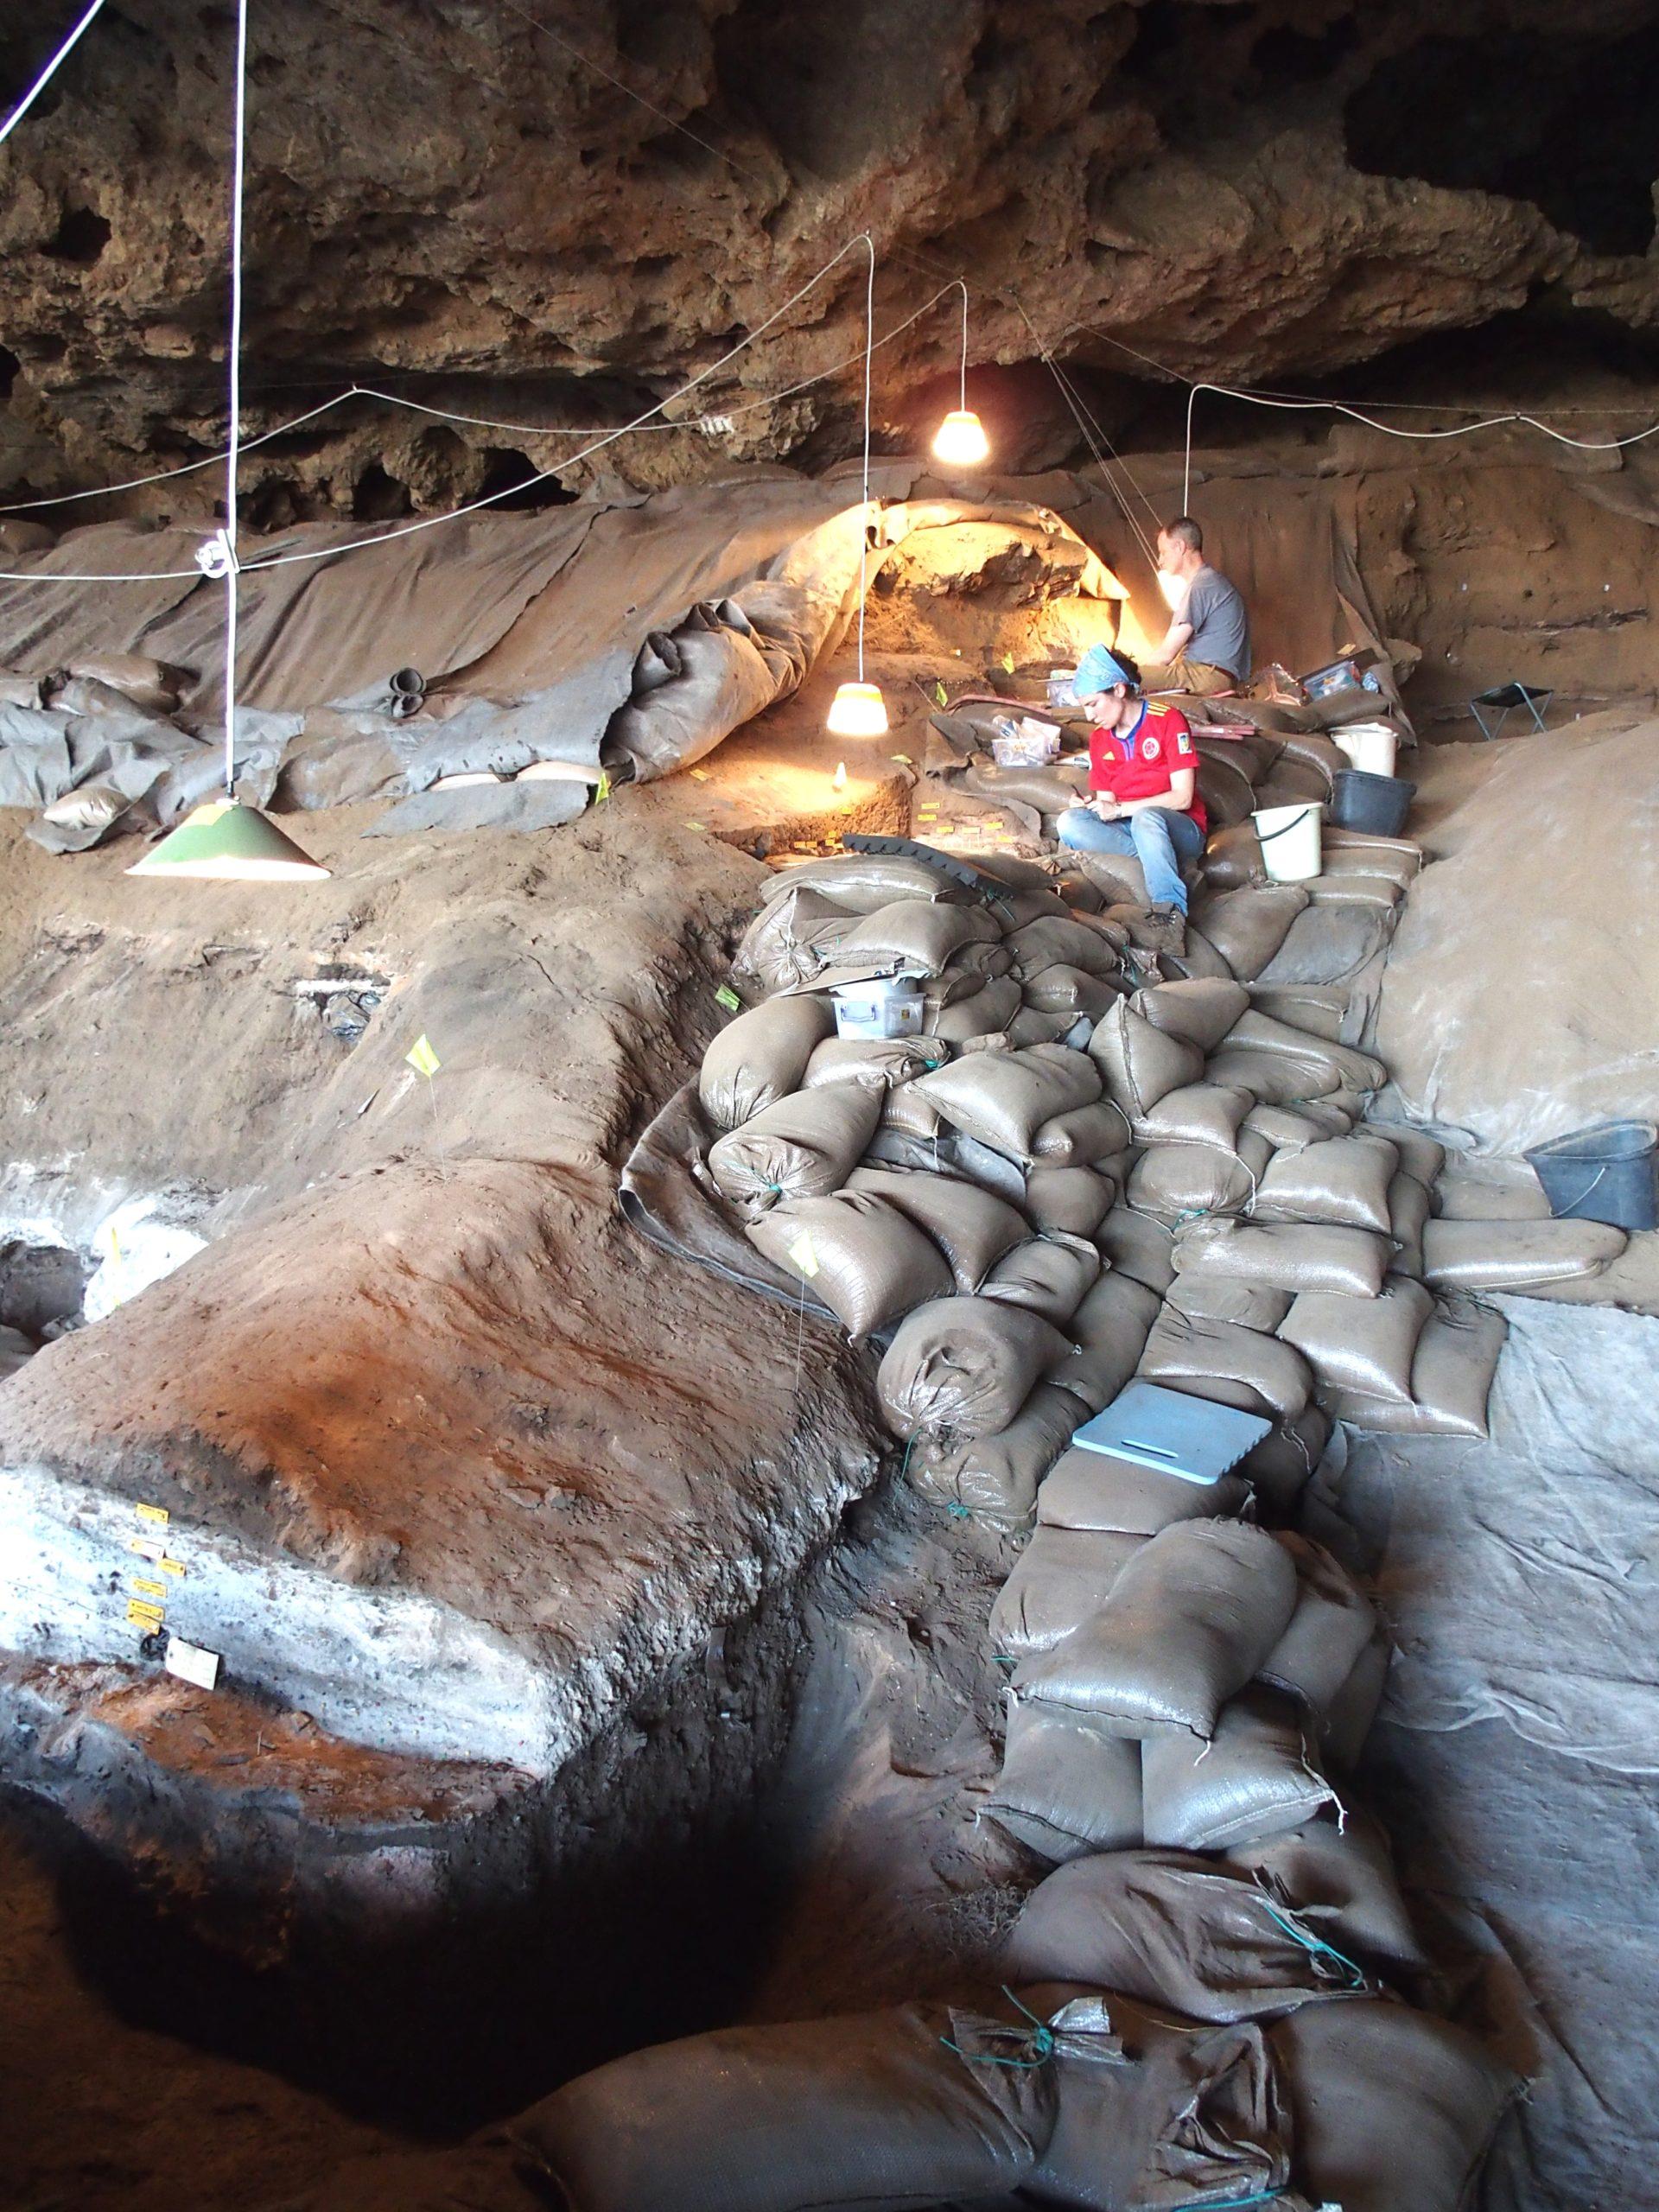 Escavações na Border Cave, na África do Sul. Crédito: D. Stratford